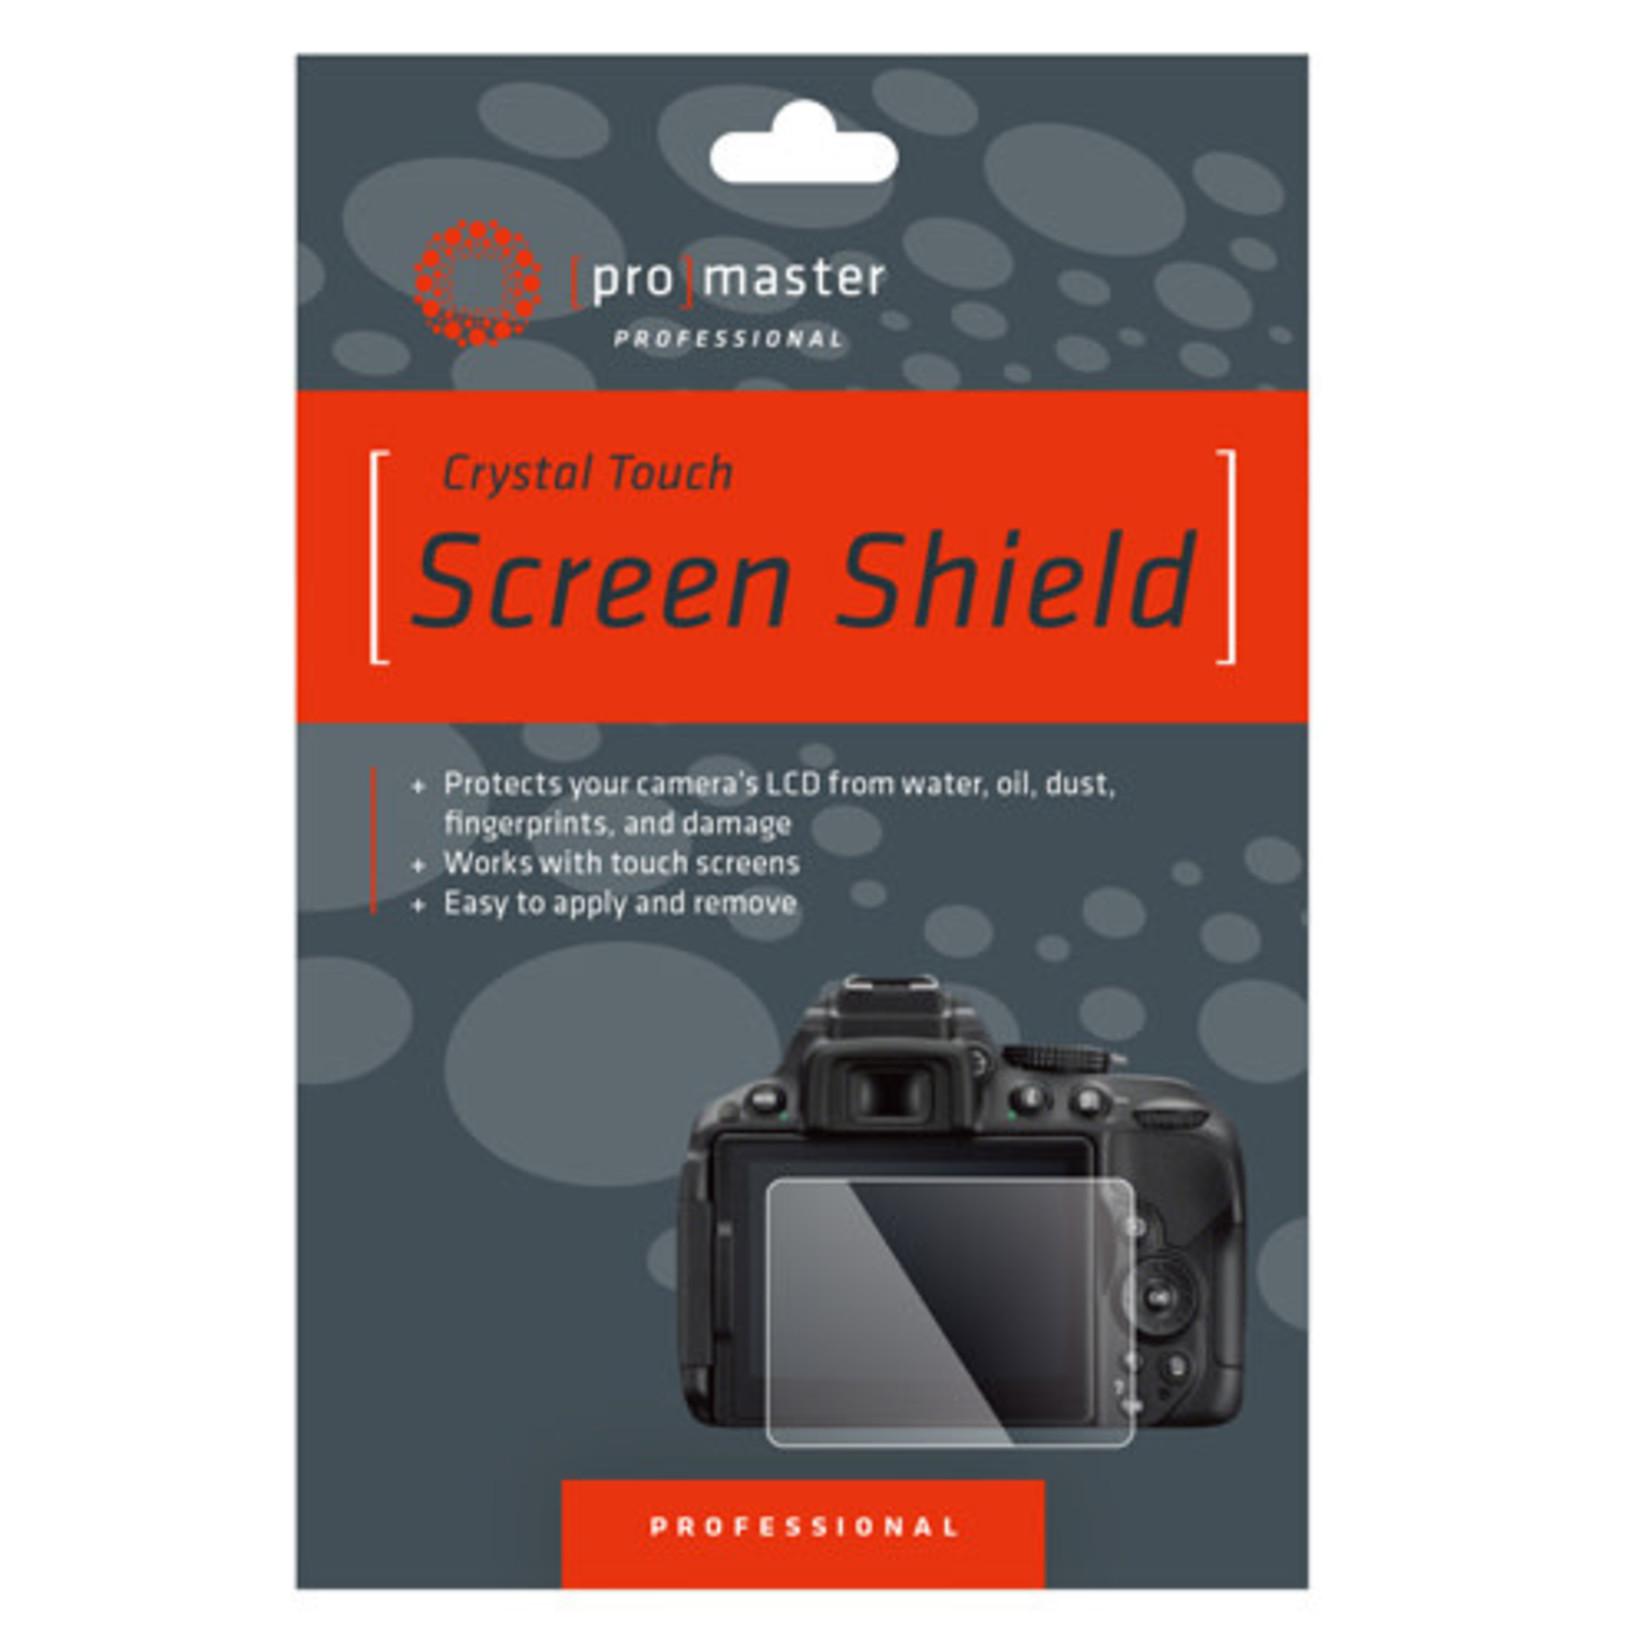 ProMaster Crystal Touch Screen Shield - Canon 5DMKIV